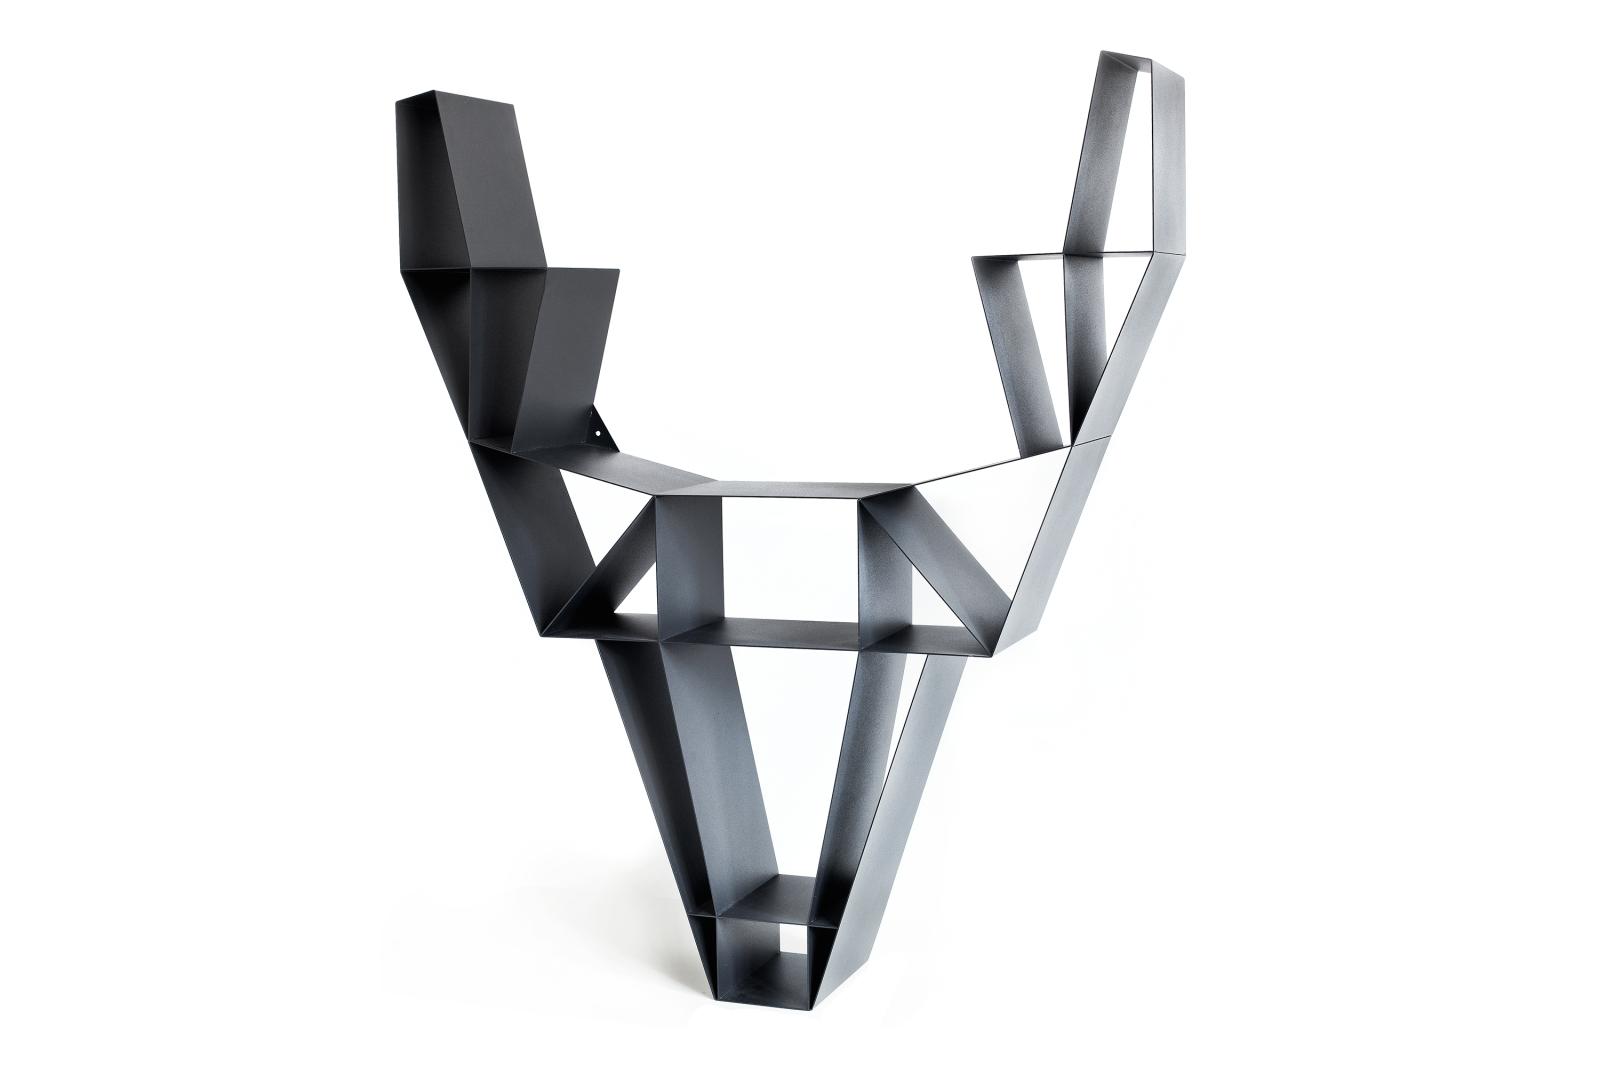 Deer Metal Shelf Charcoal Black, Large